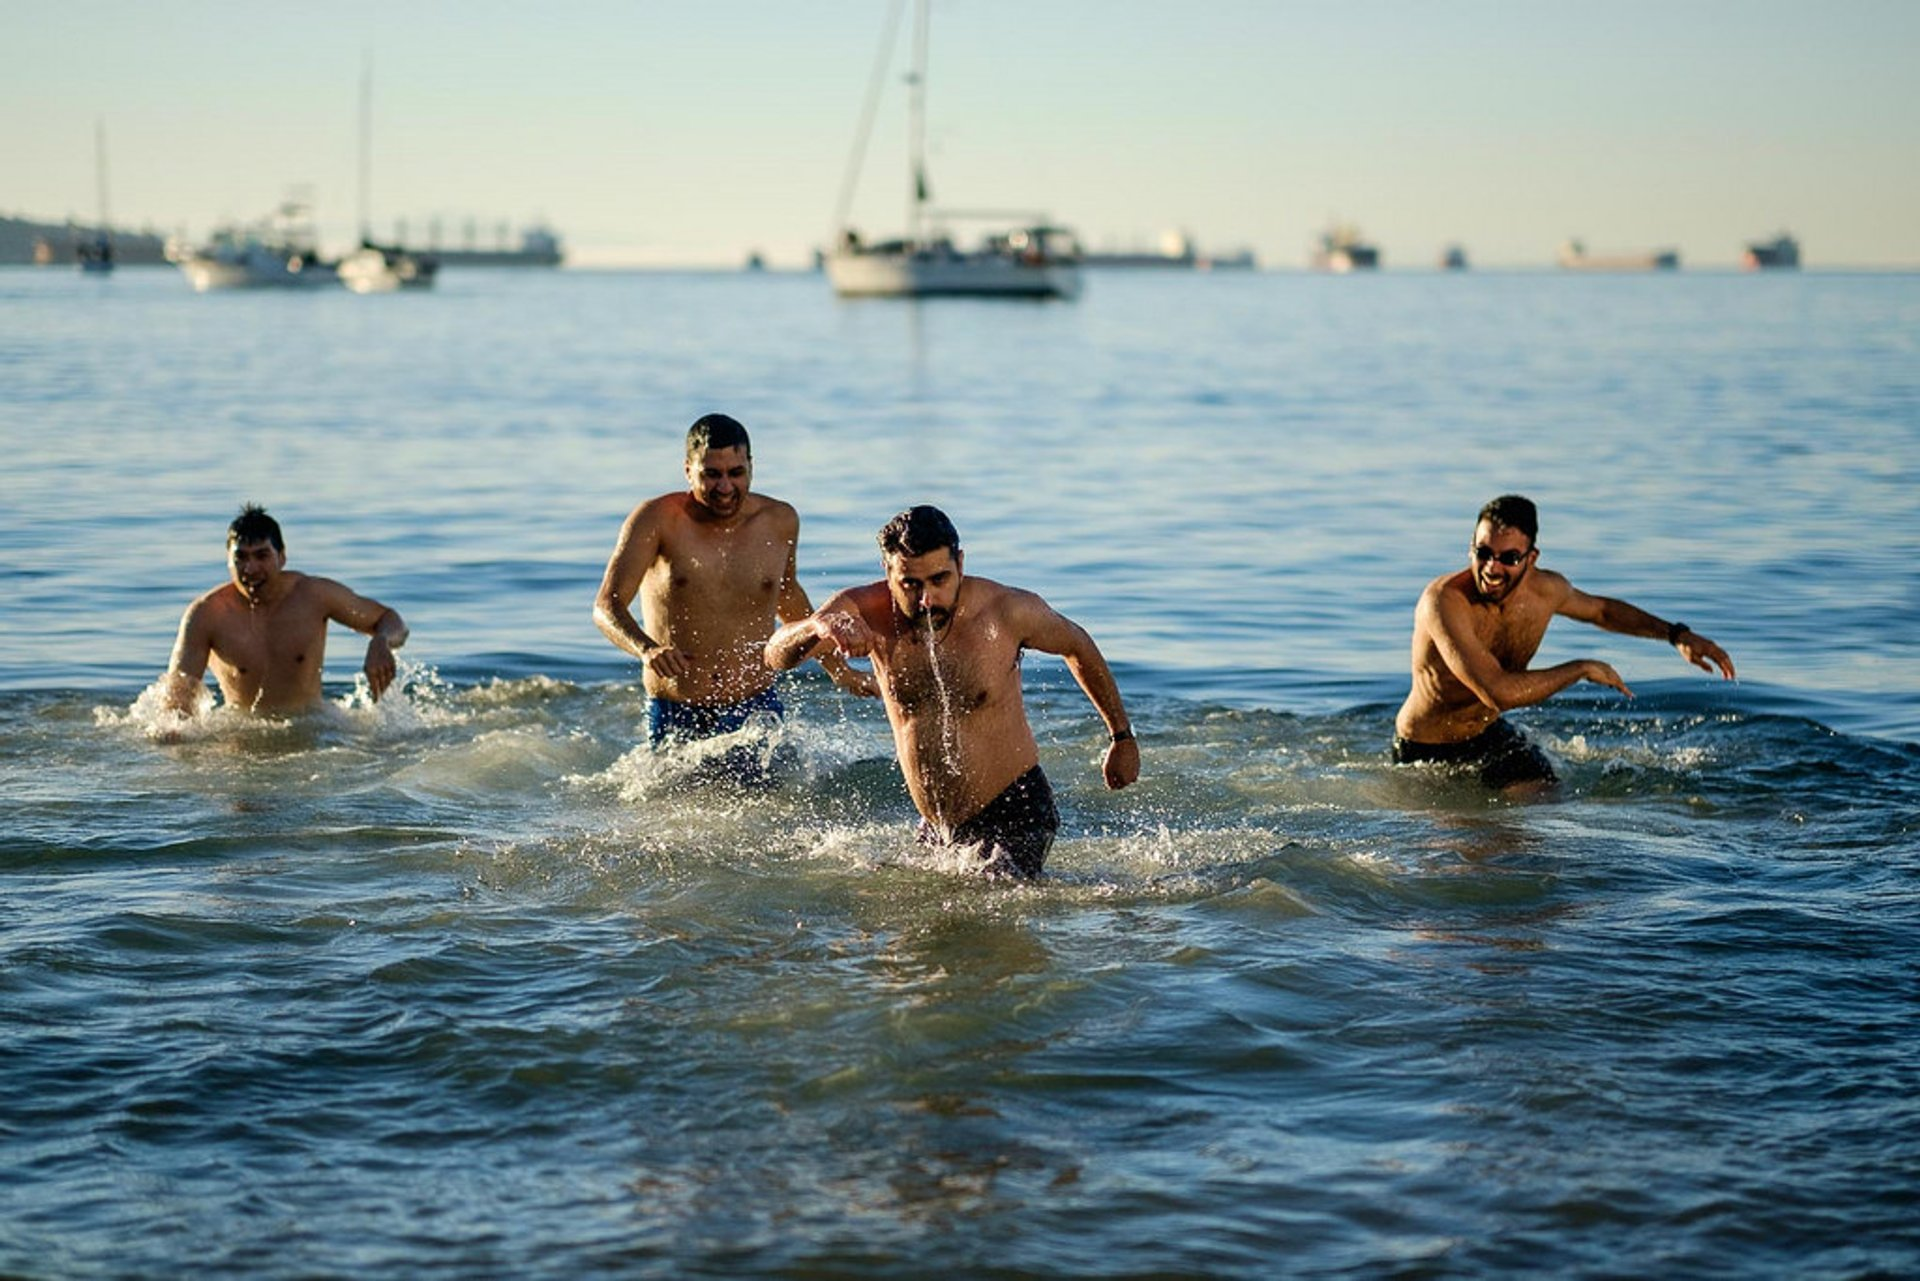 The Annual Polar Bear Swim 2020